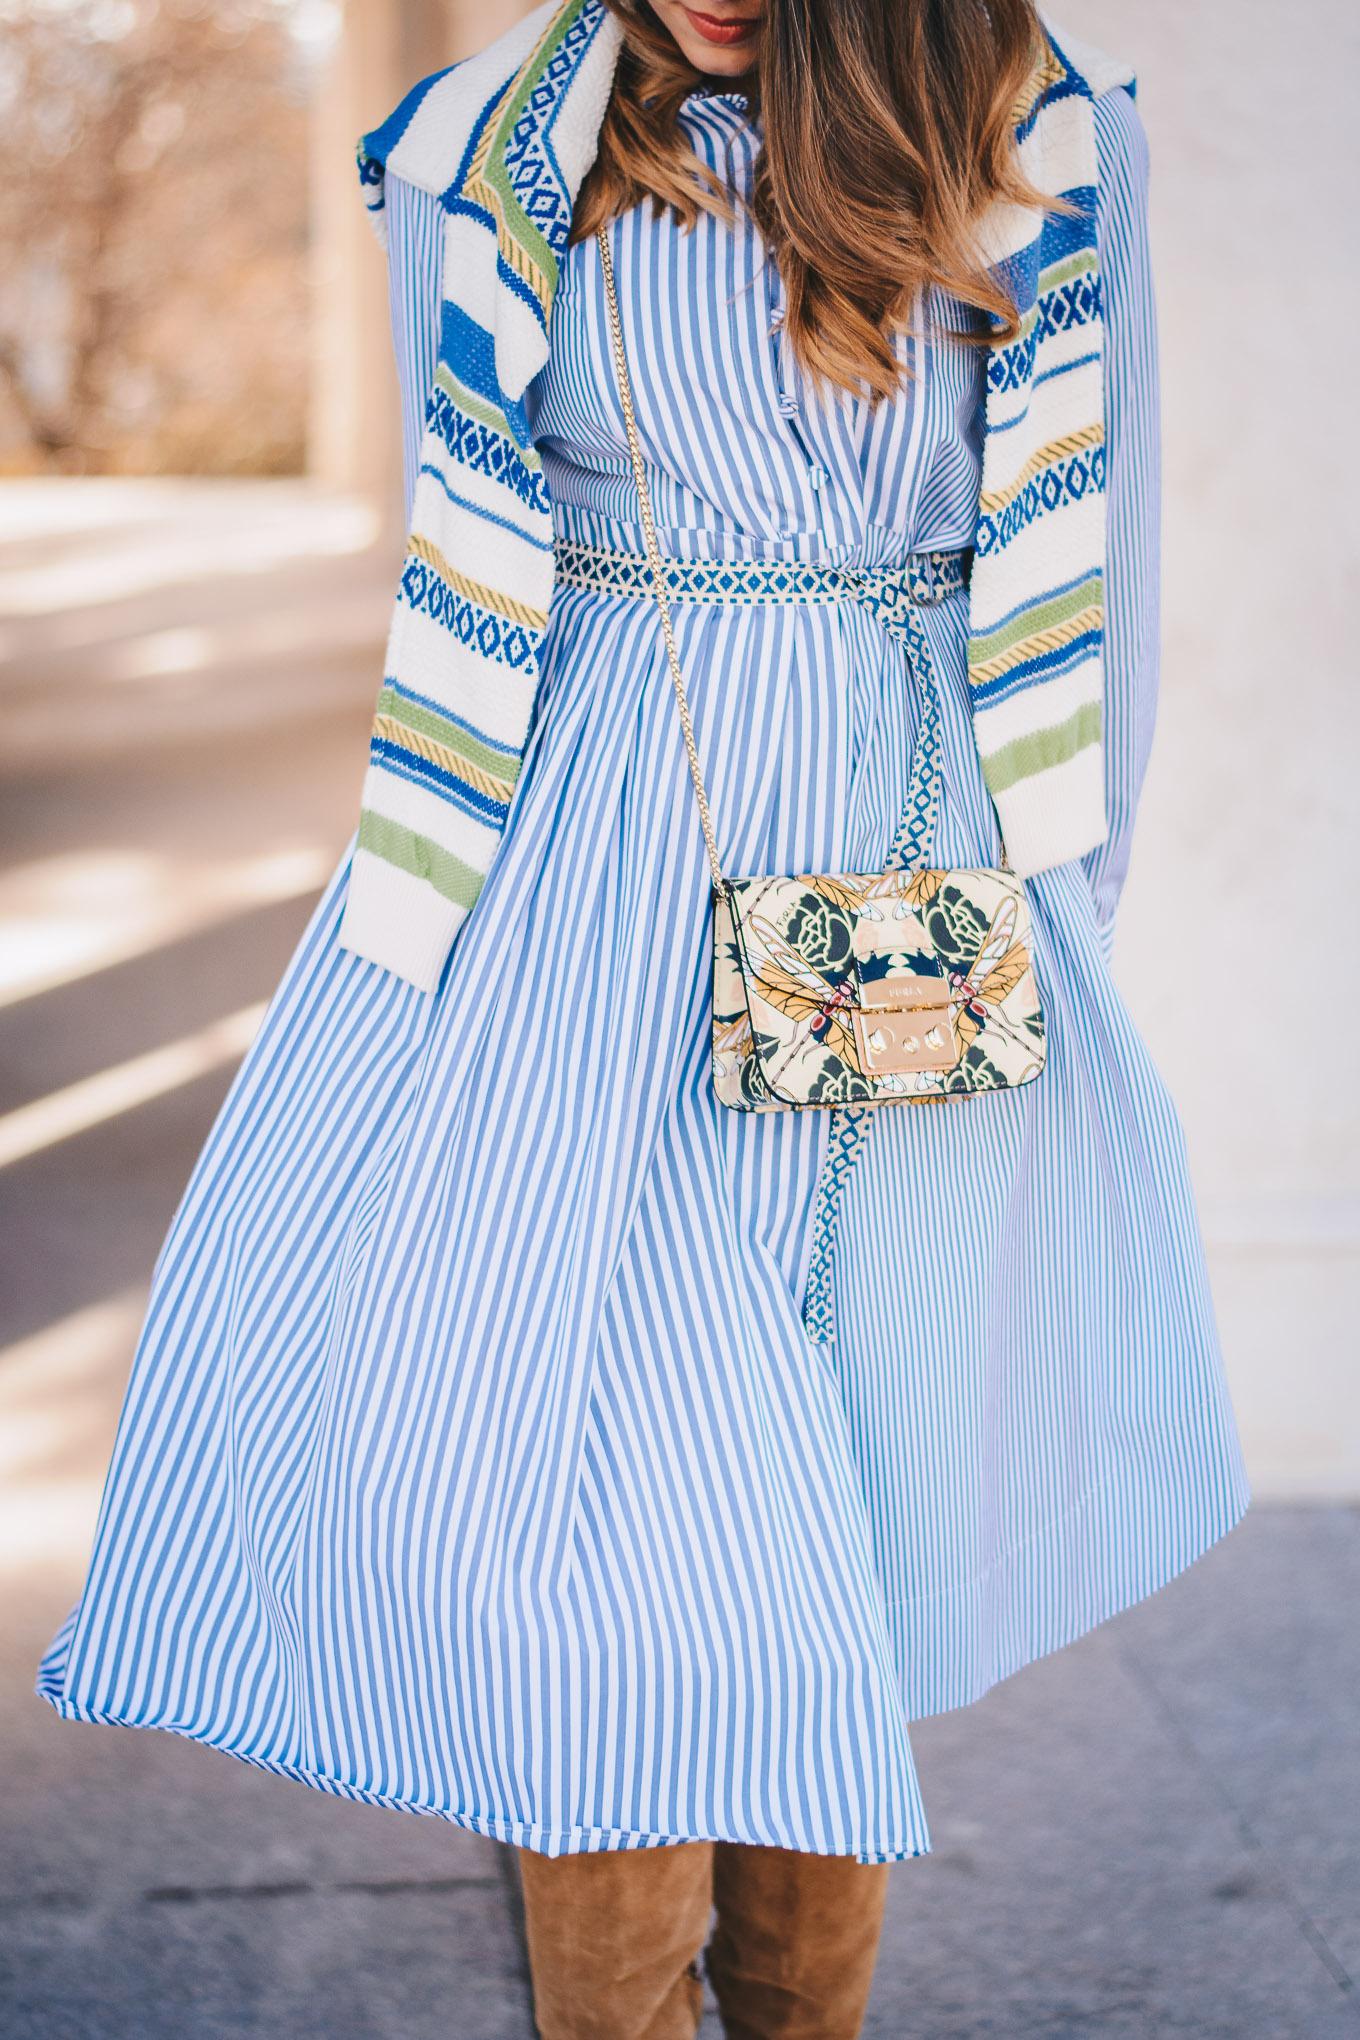 Weekend by Max Mara dress